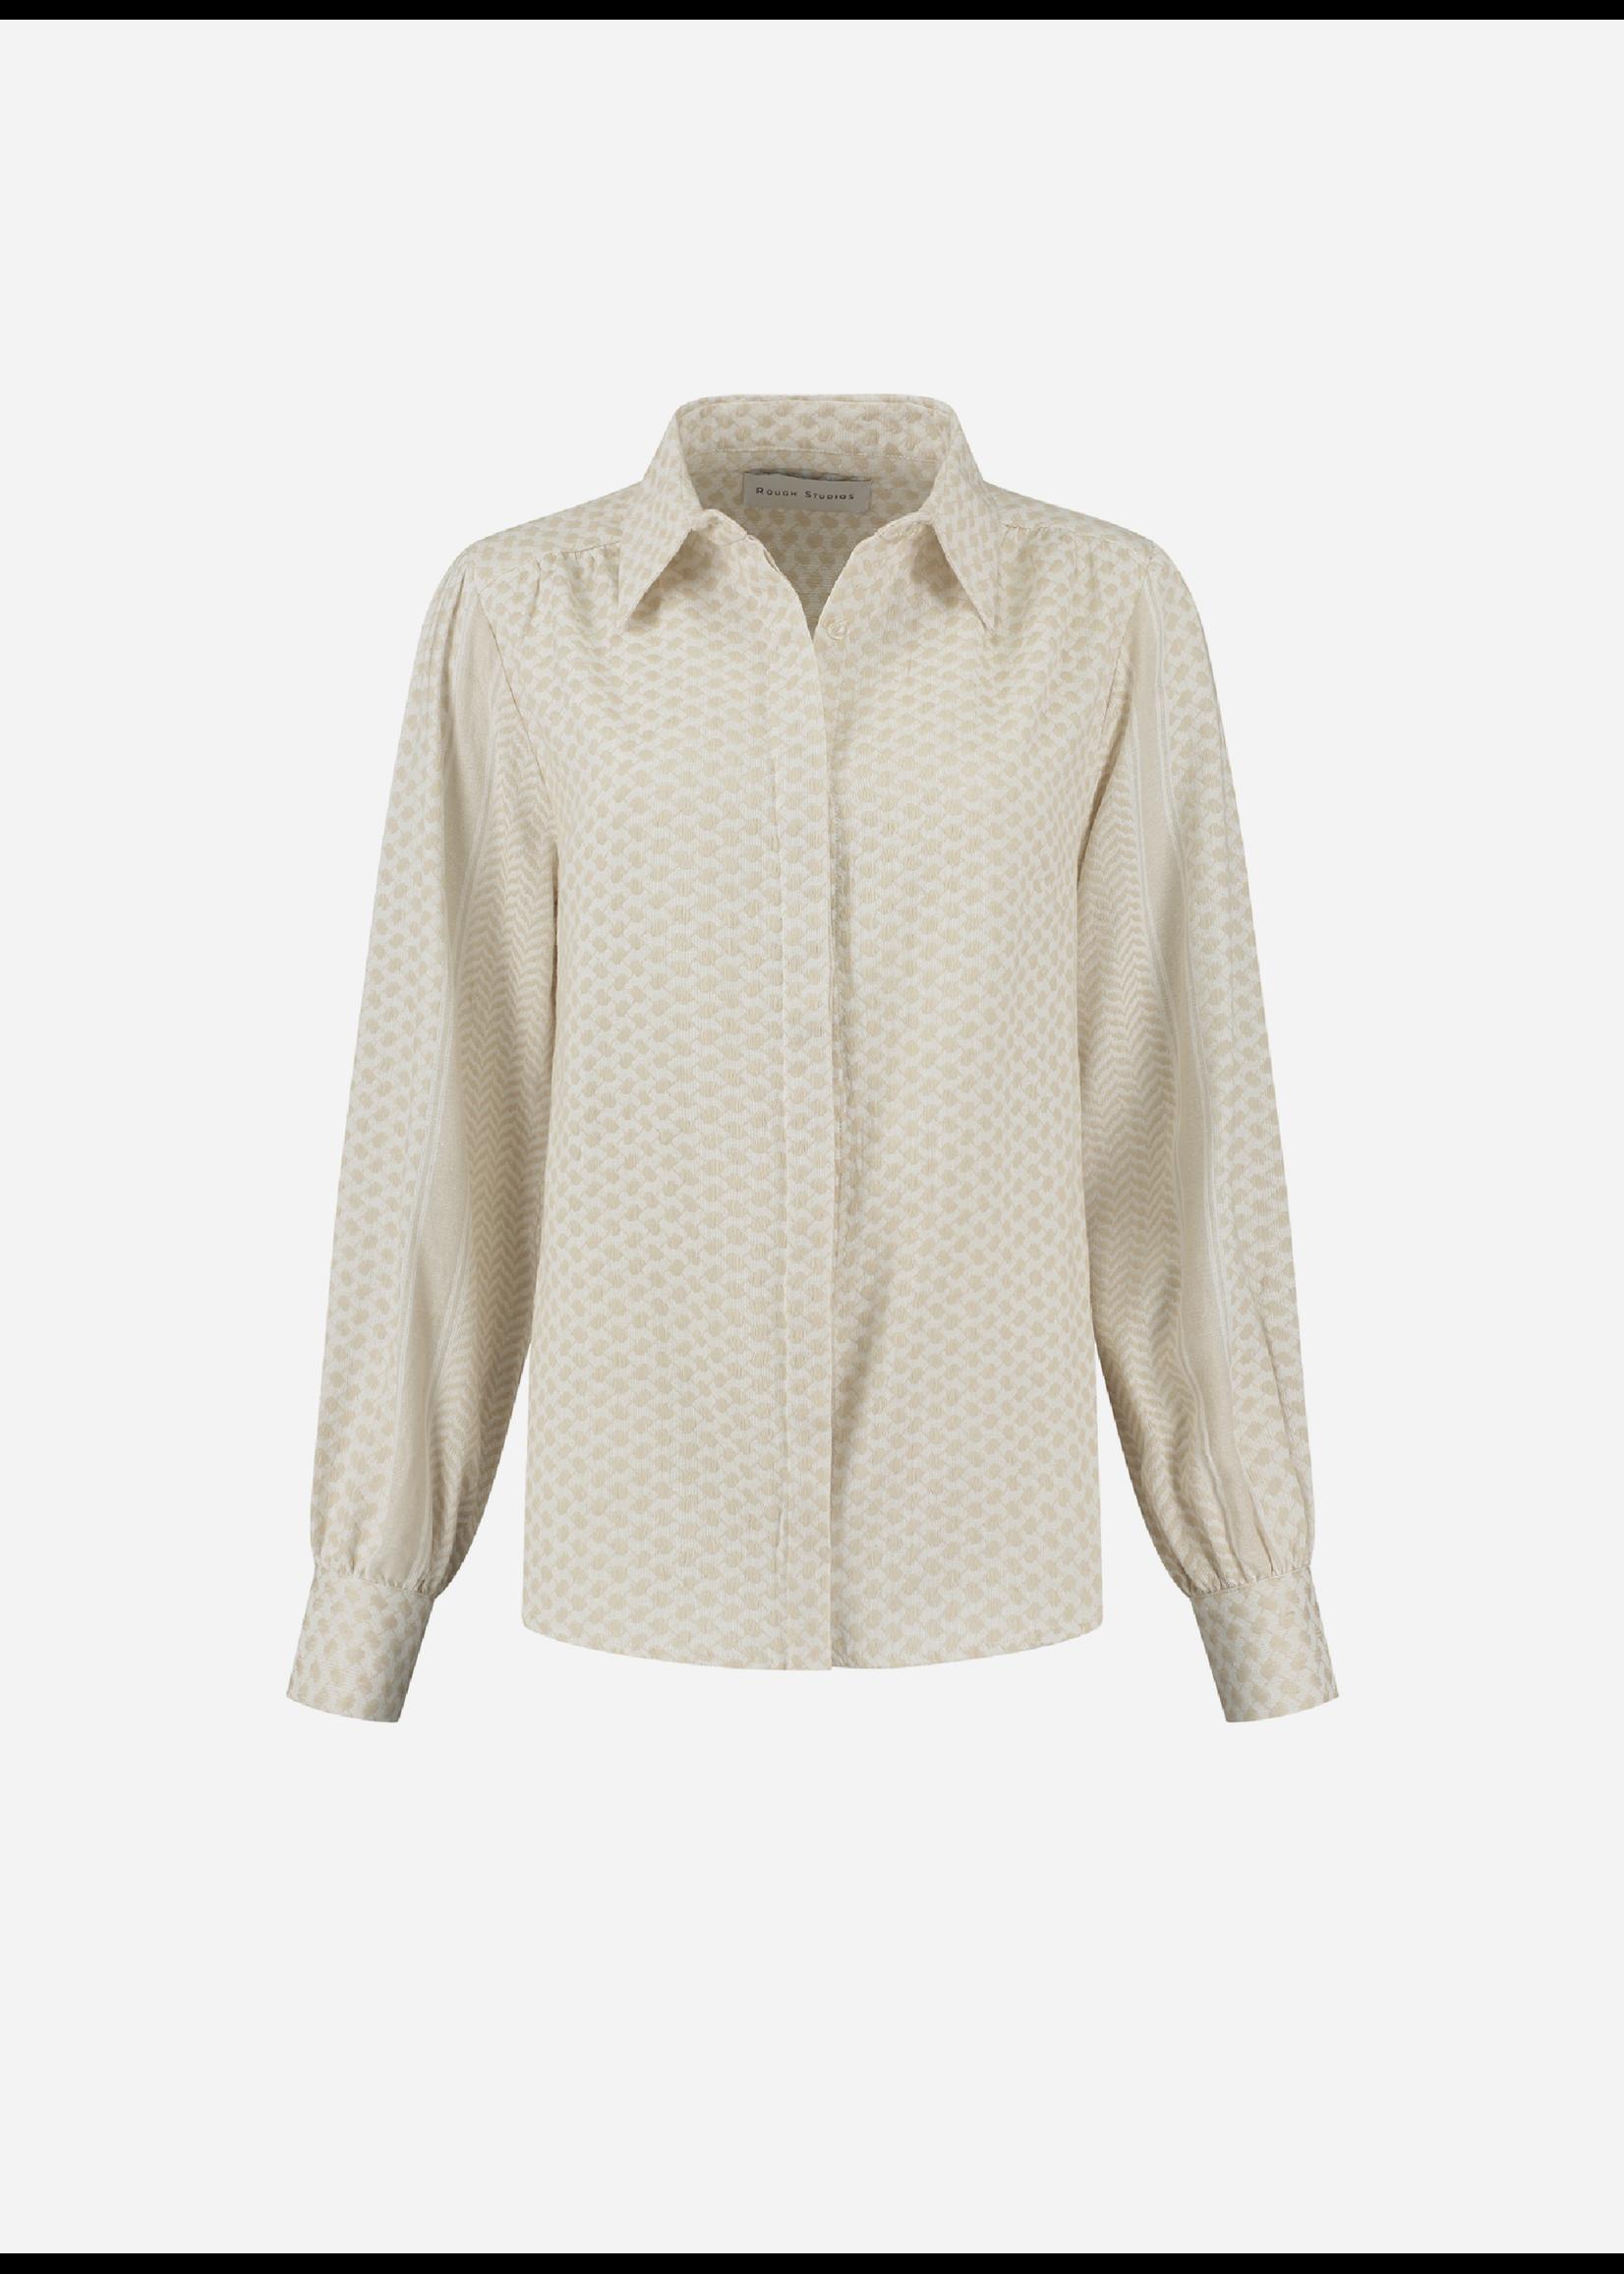 Rough Studios Bibi blouse beige/white